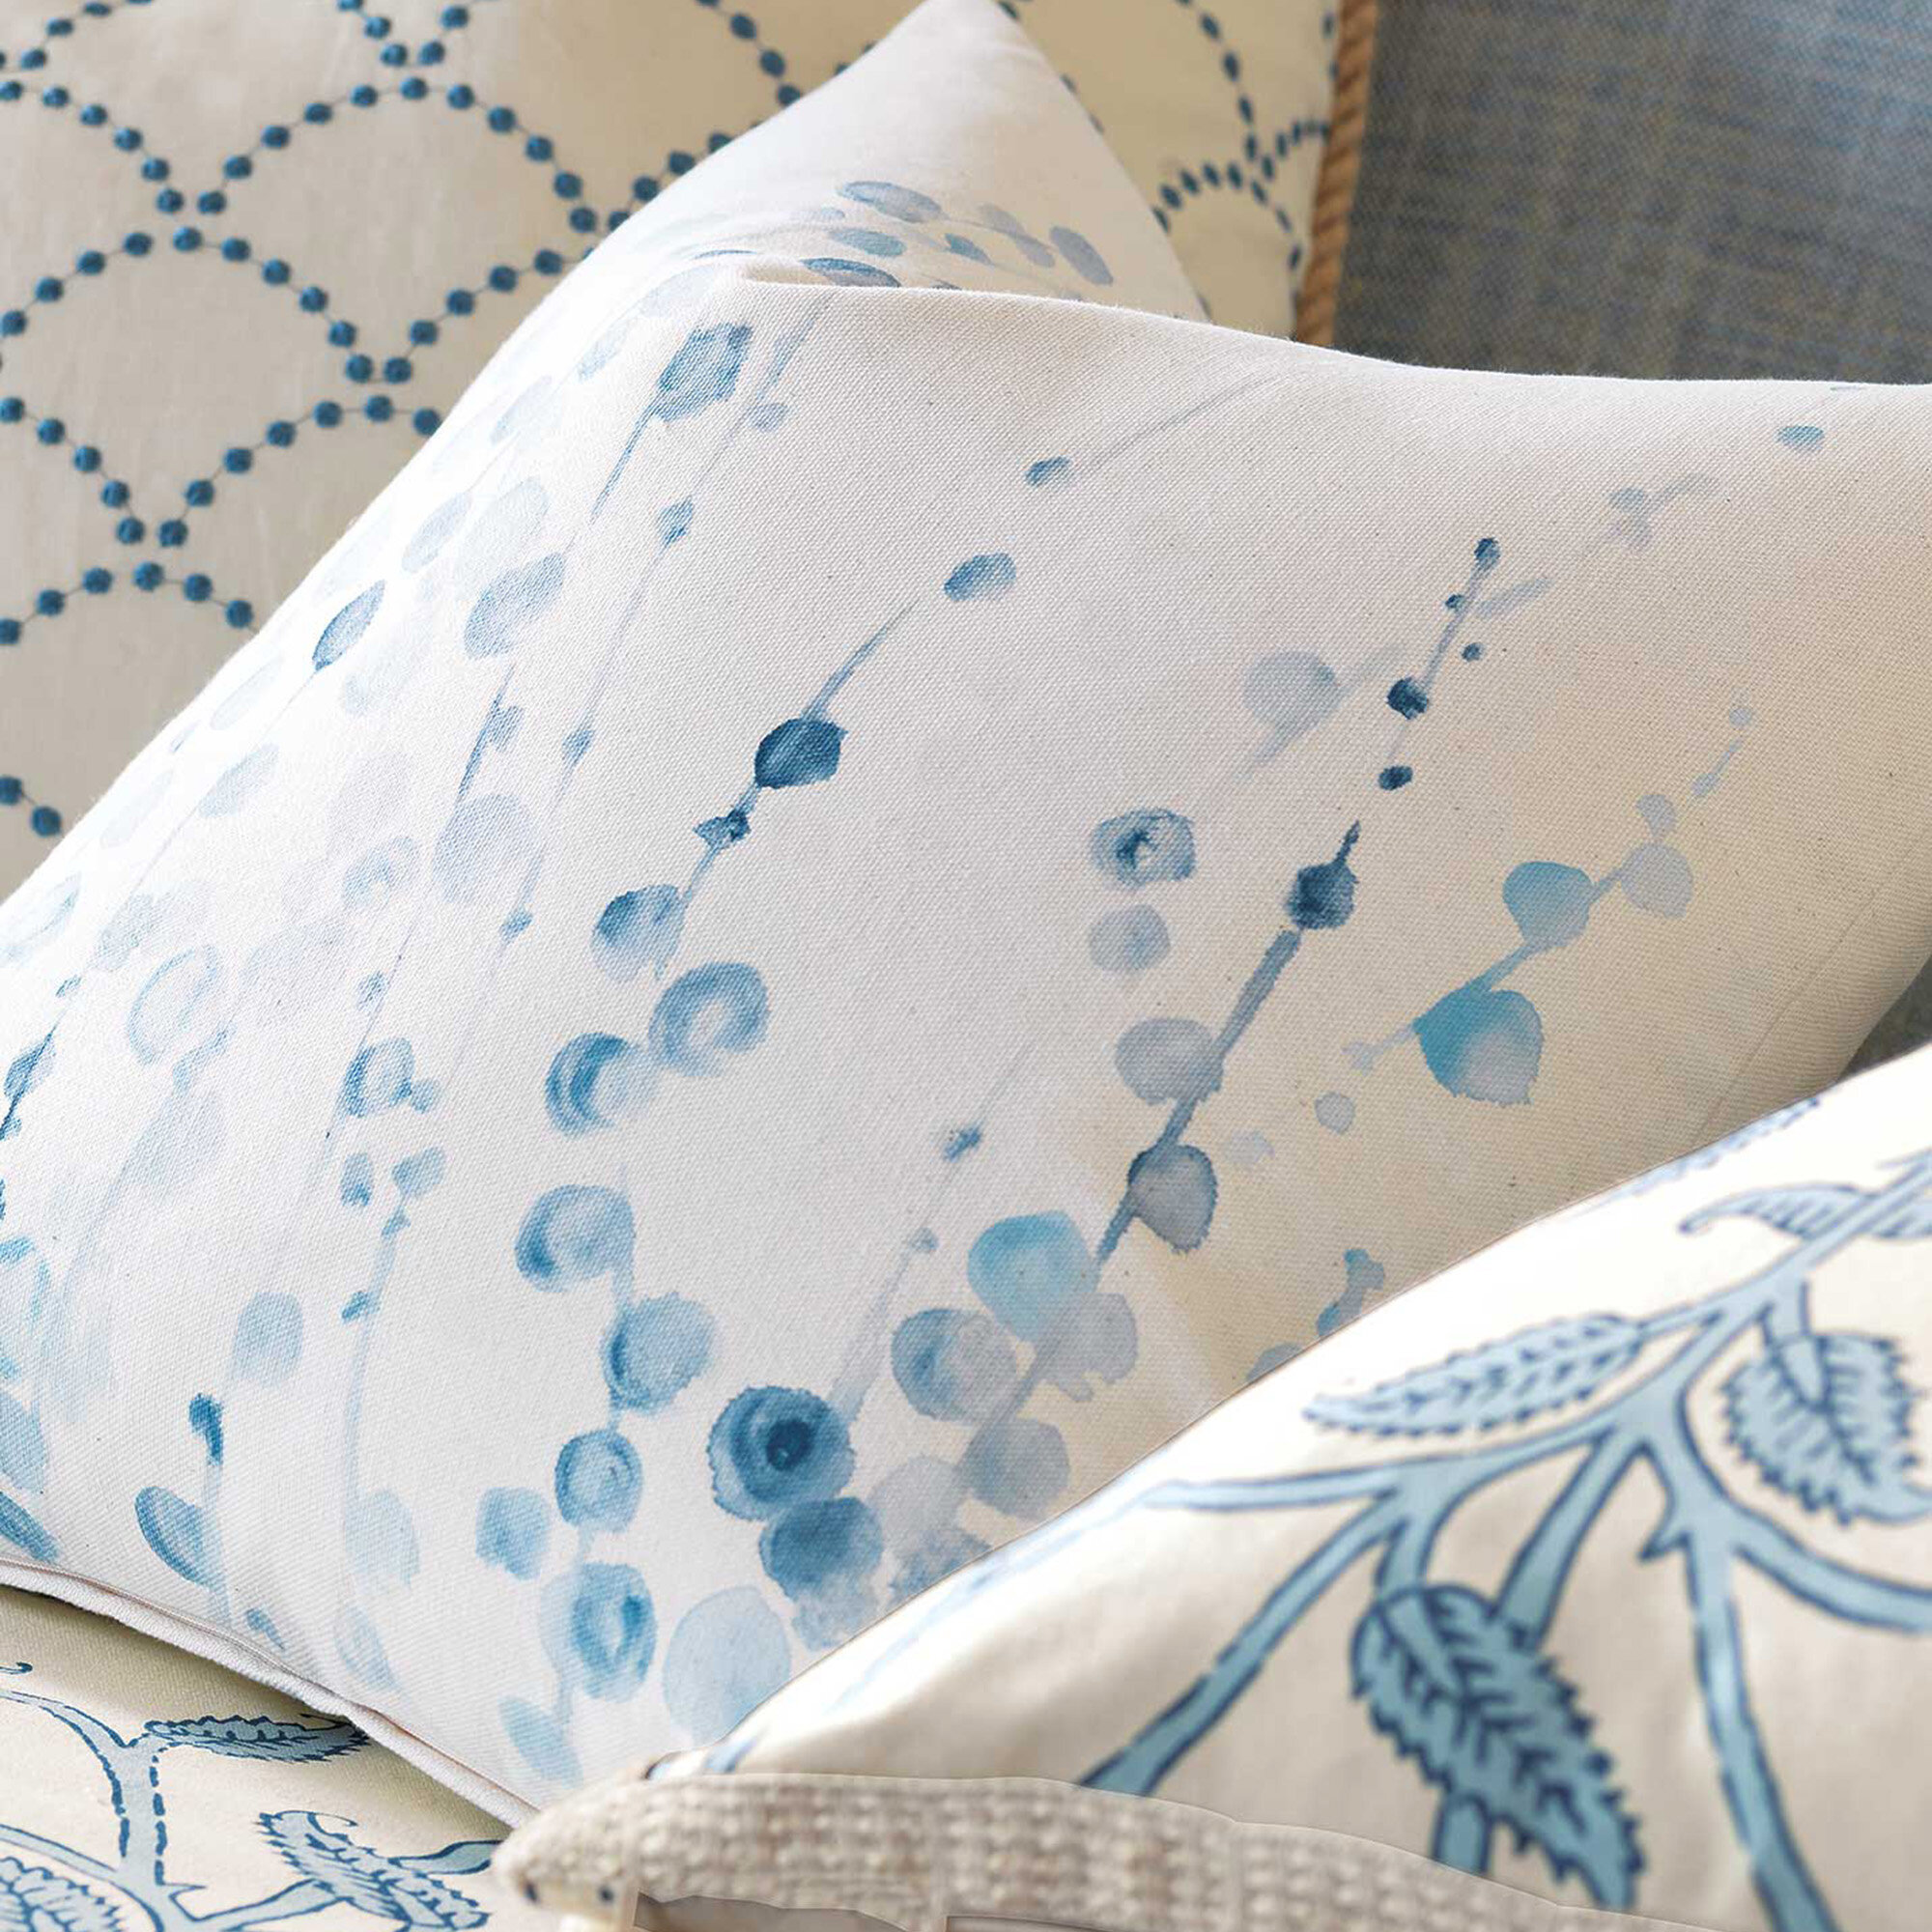 Eastern Accents Badu Adler Hand Painted Throw Pillow Wayfair